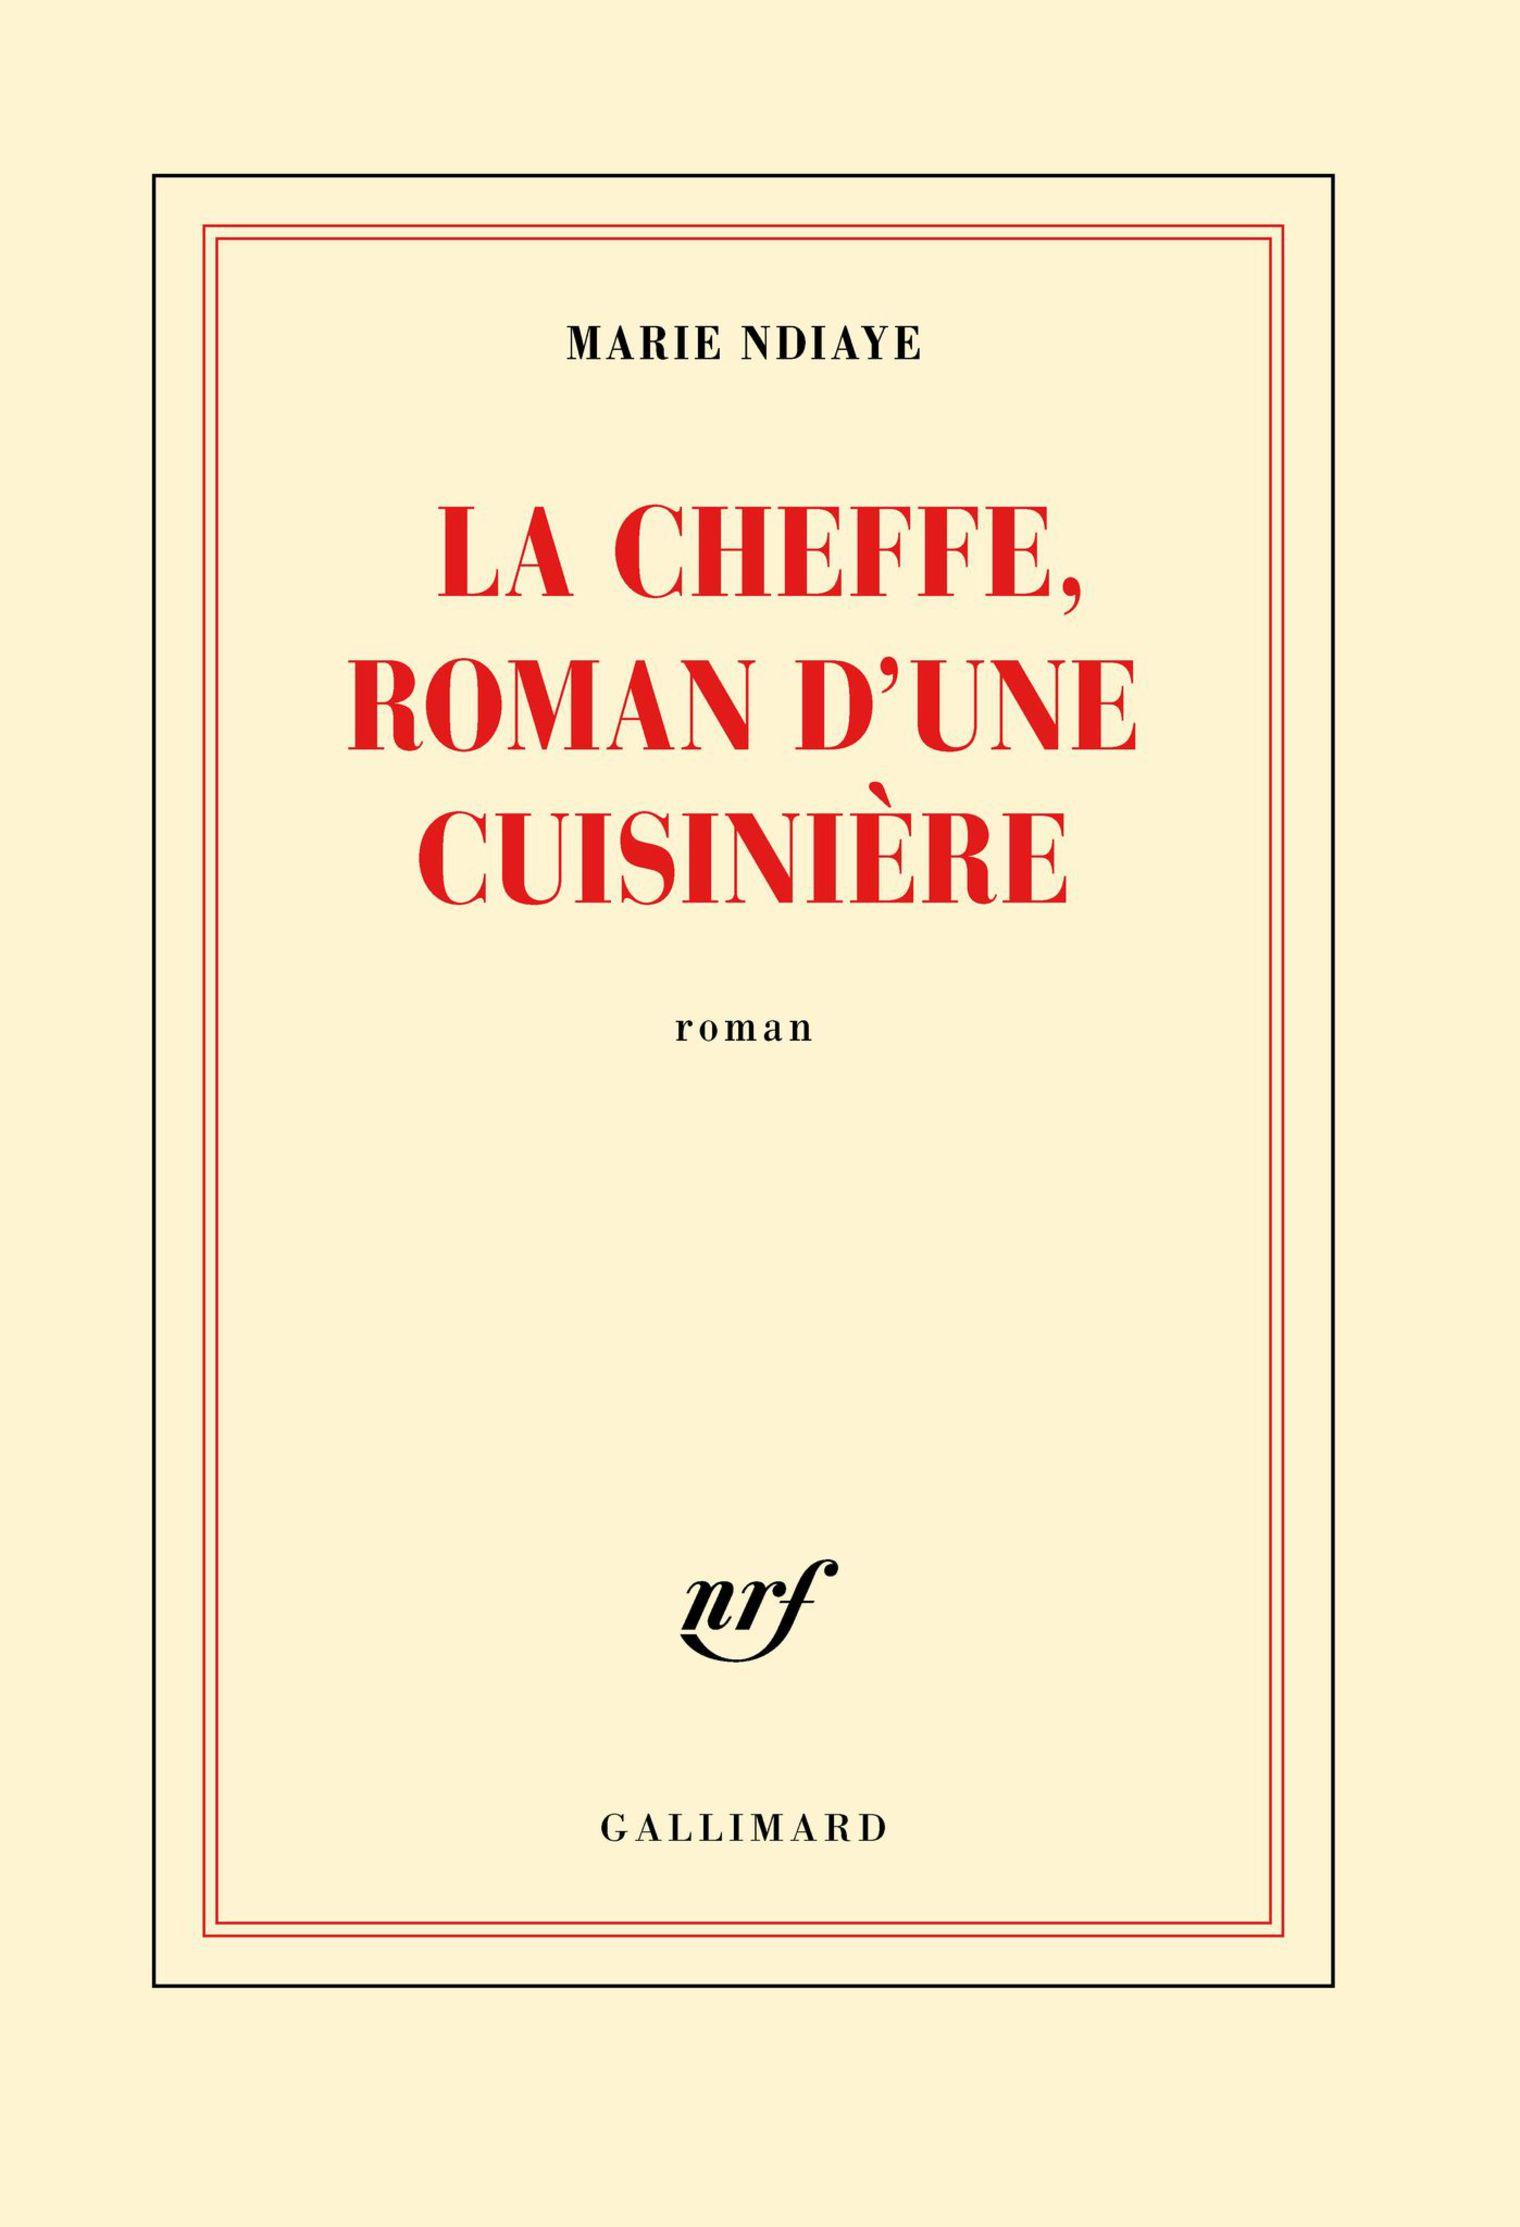 la cheffe roman d une cuisiniere par marie ndiaye - Editions Gallimard